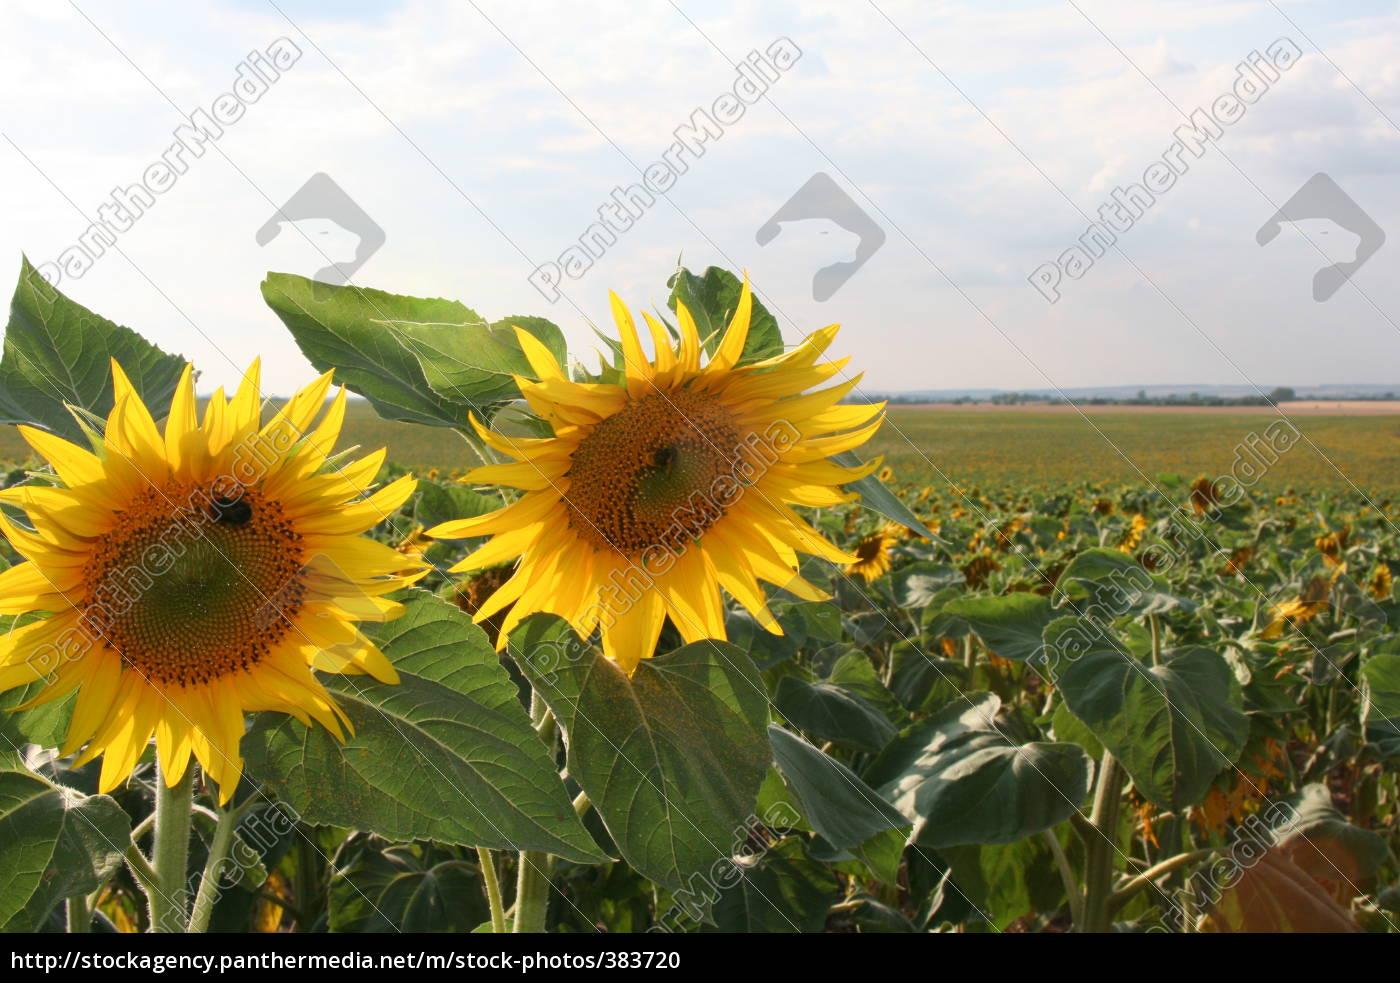 sunflower, field - 383720